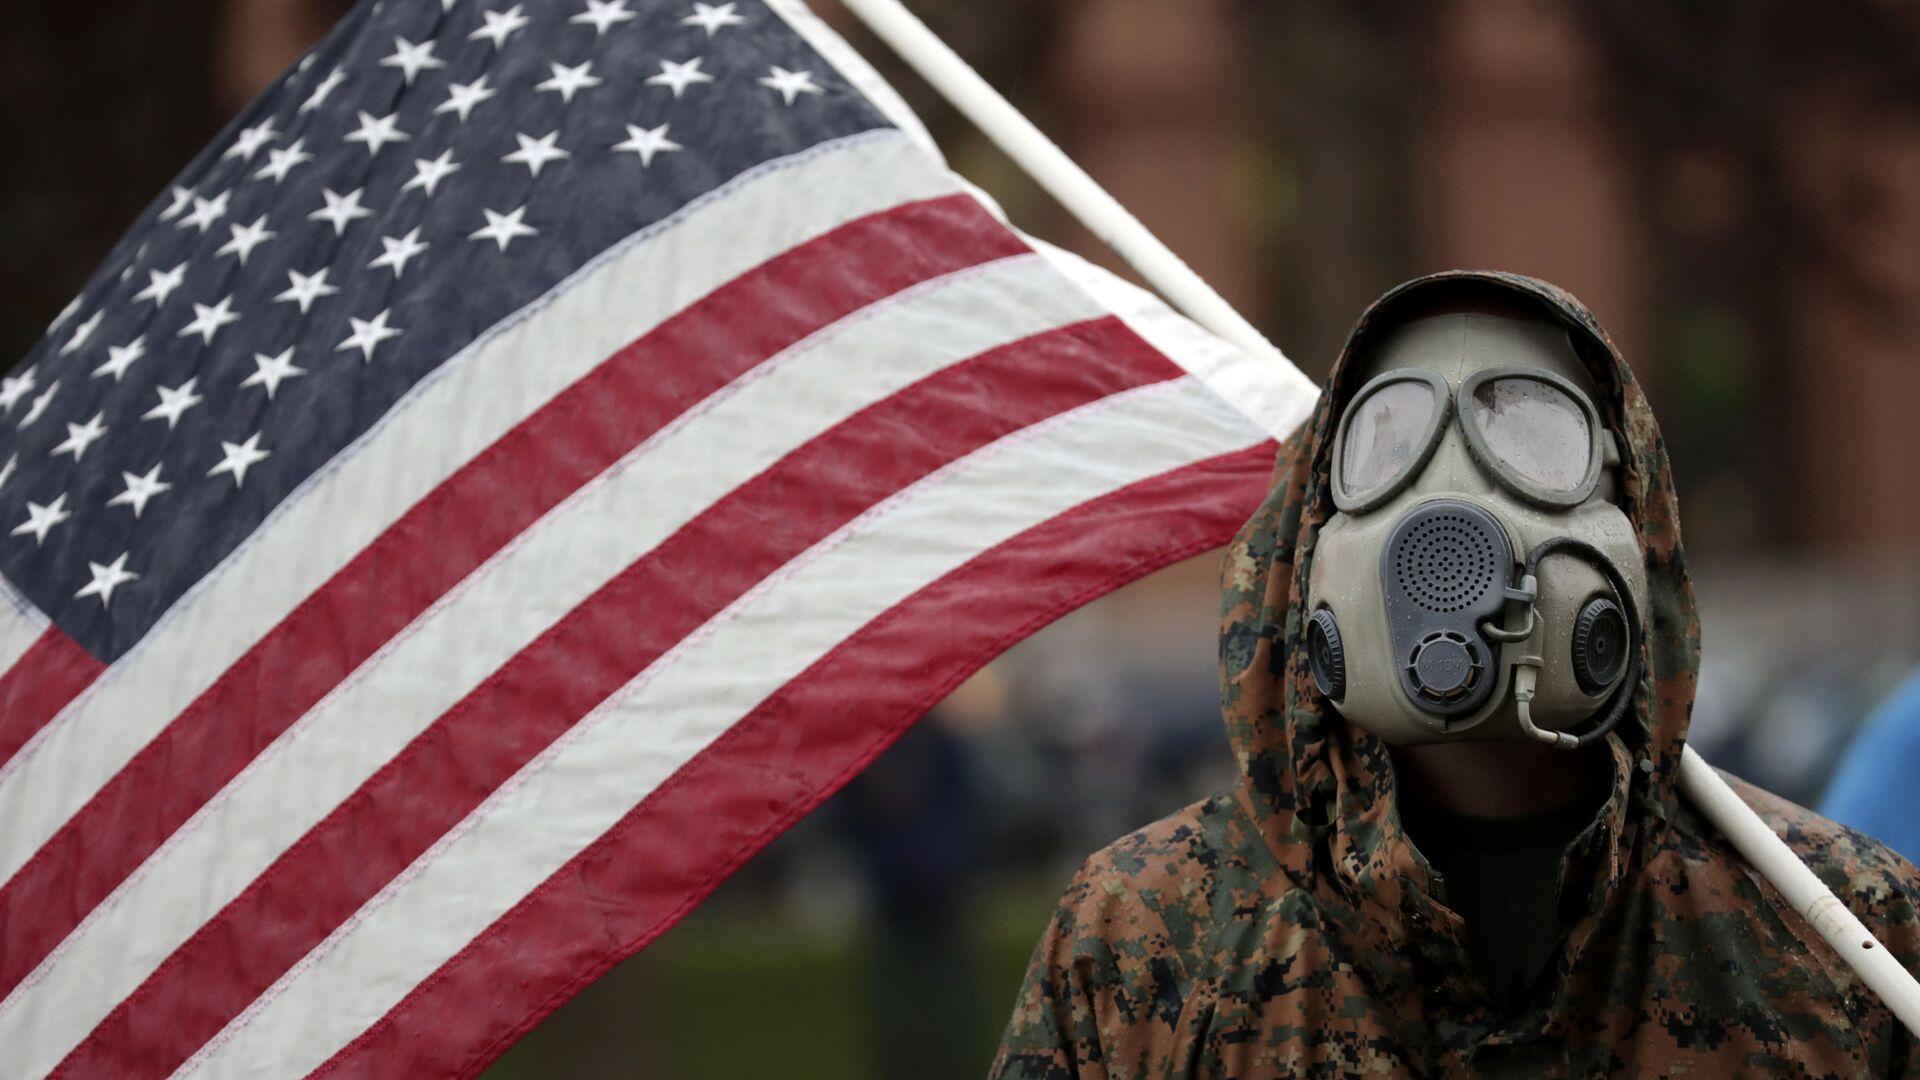 Пандемия коронавируса COVID - 19 - житель США в противогазе с флагом - Sputnik Грузия, 1920, 05.03.2021